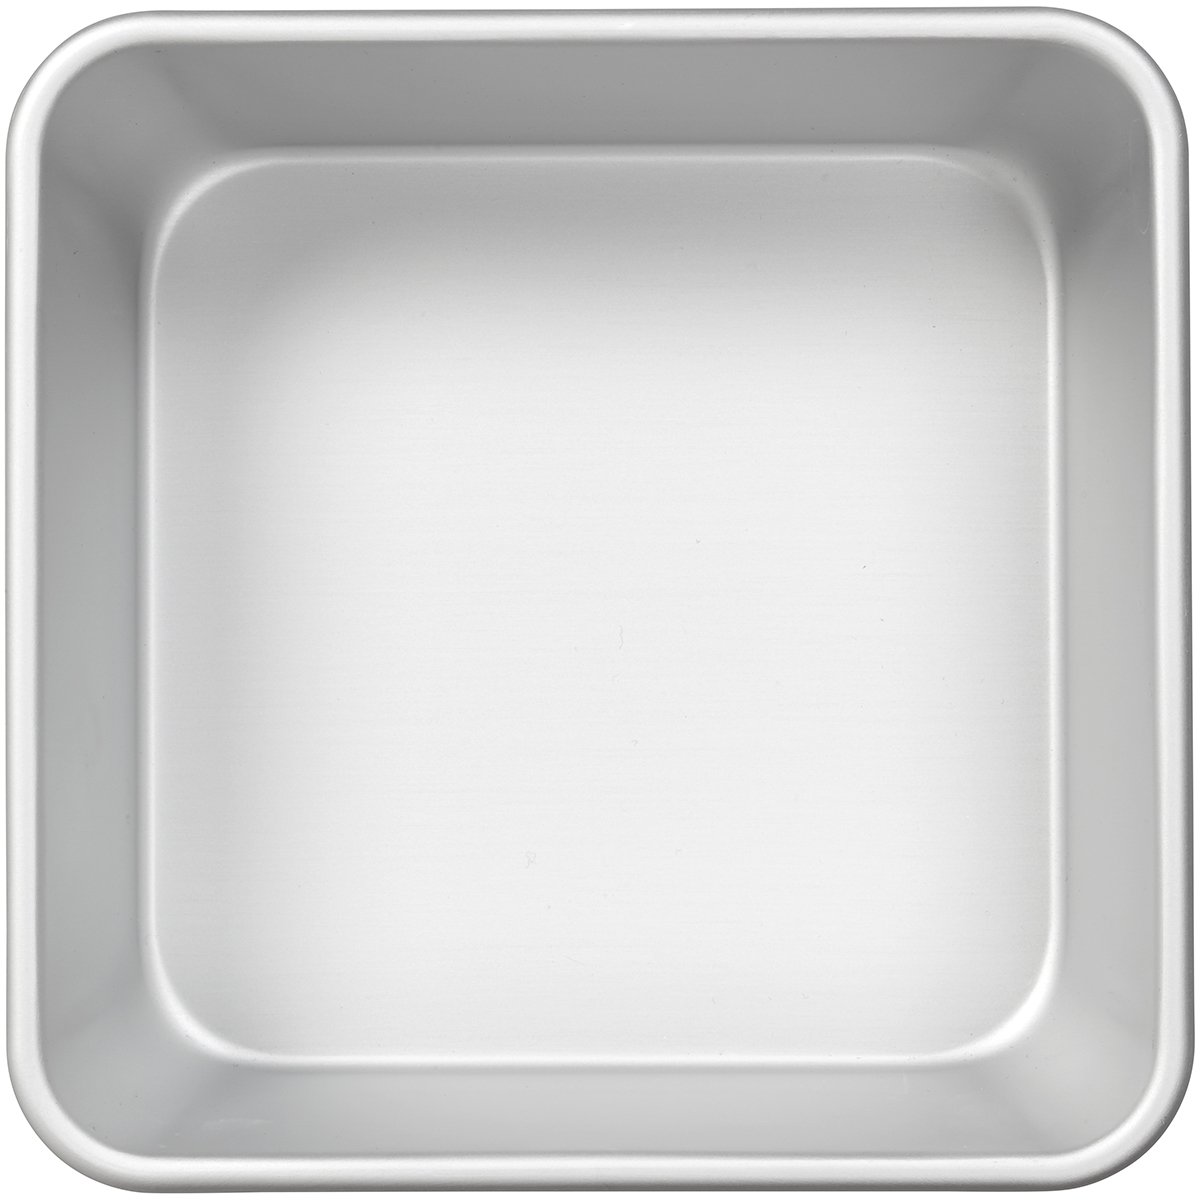 Wilton Performance Pans Square Cake Pan; 6-Inch